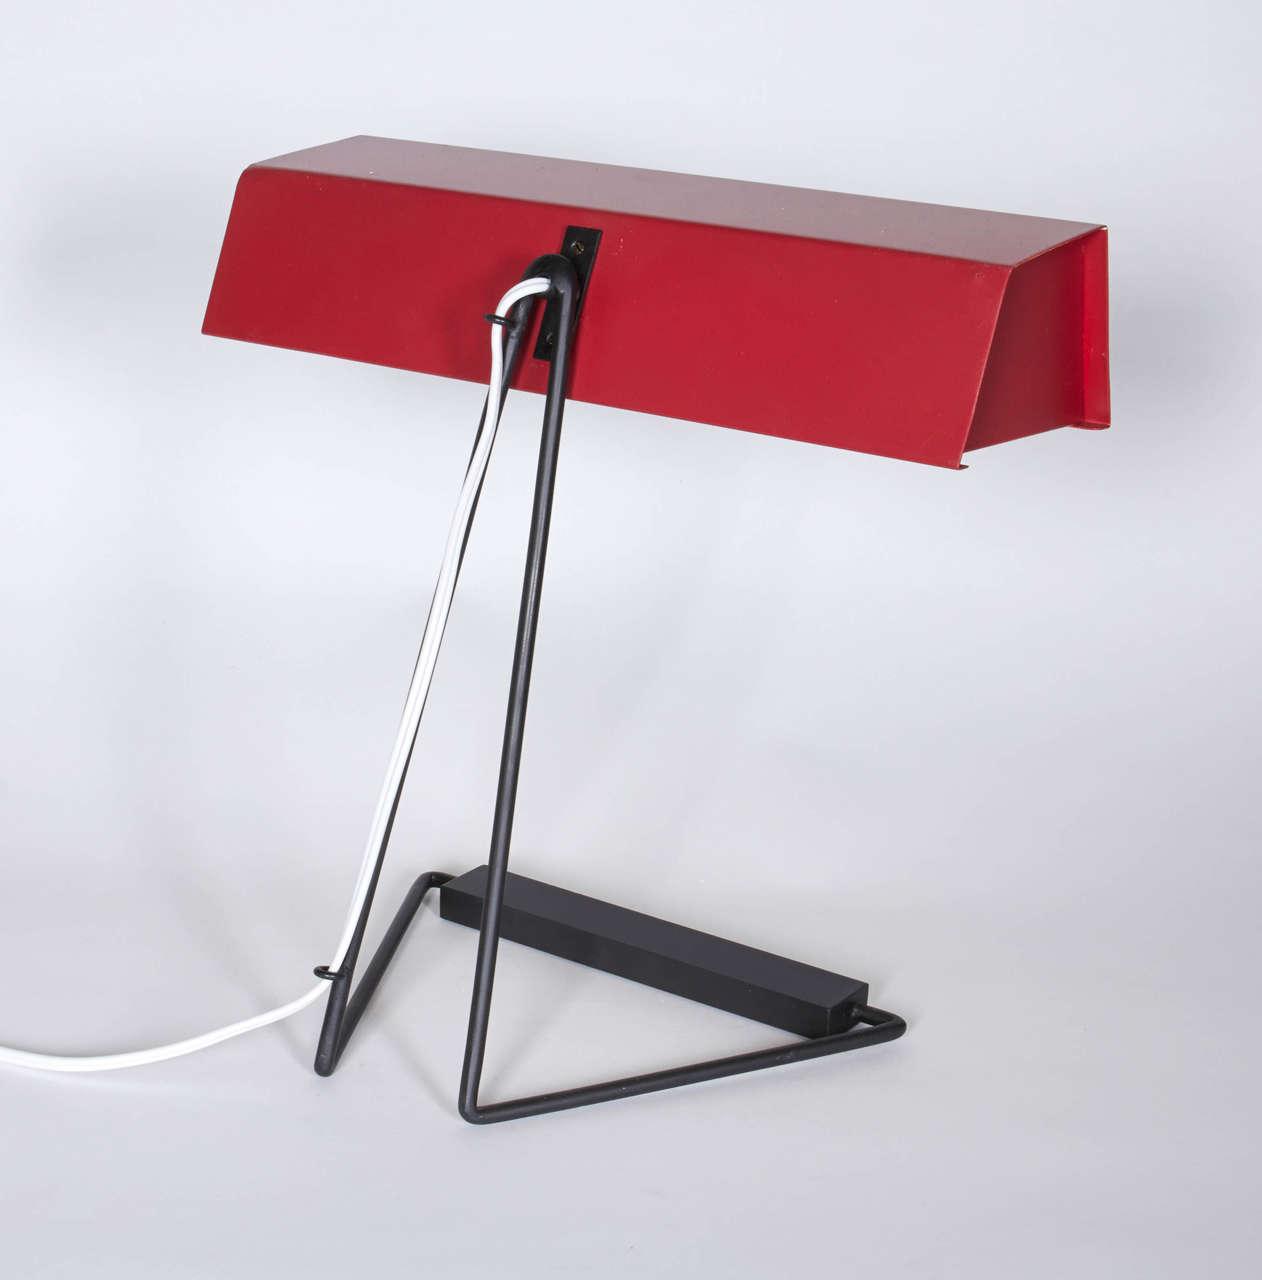 Mid-Century Modern Red Desk Lamp by Stilnovo, Italy1950s  For Sale